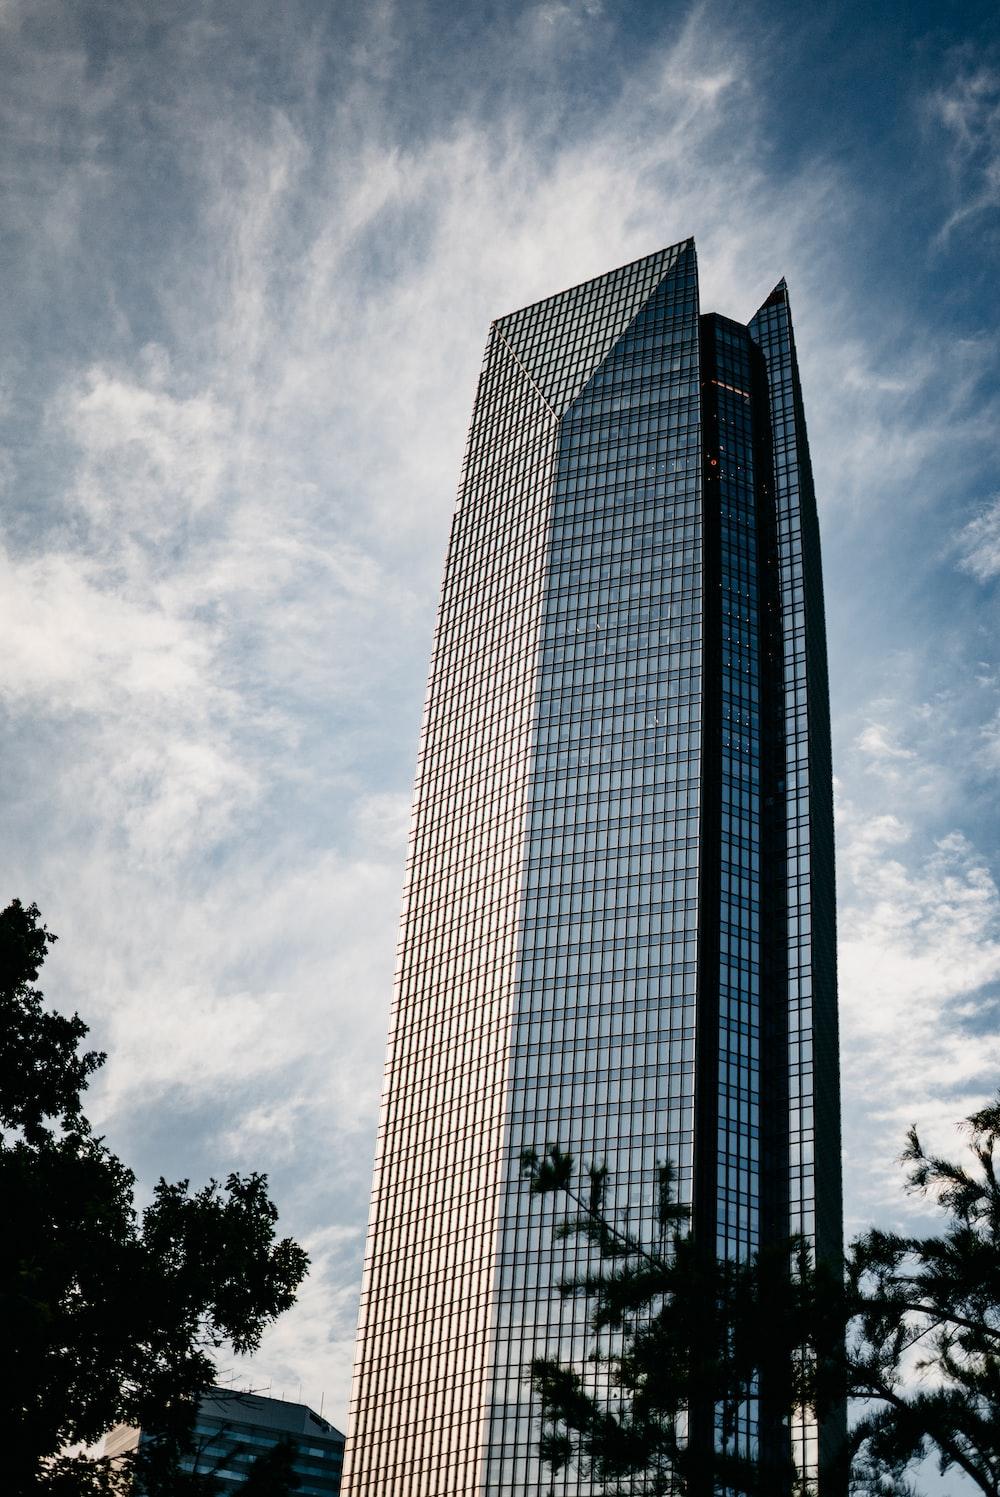 gray concrete building under gray clouds